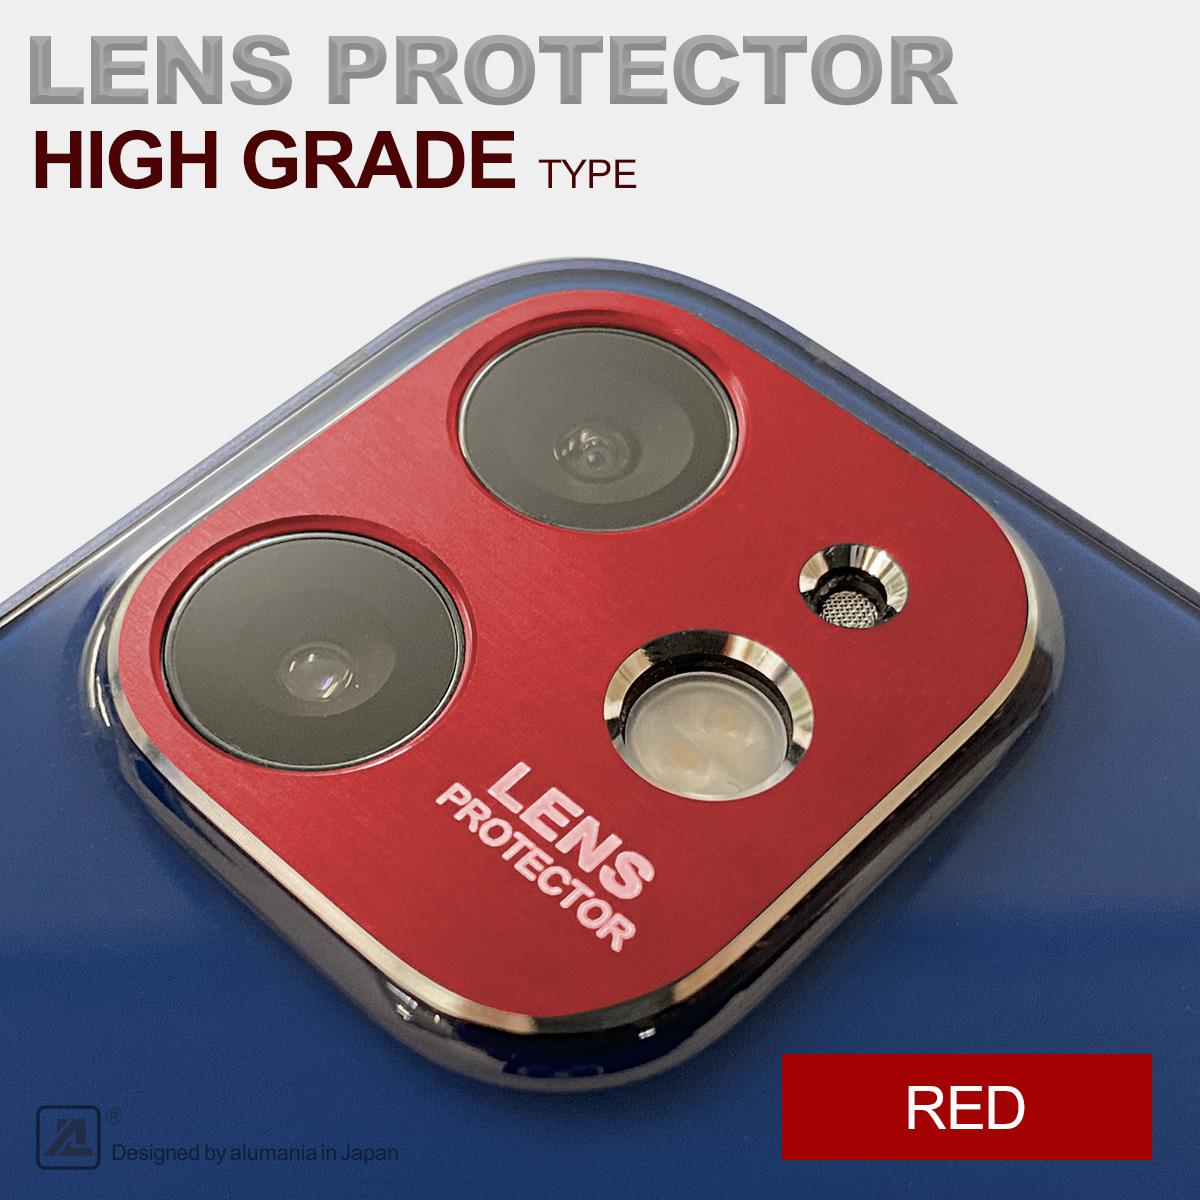 iPhone12MiniレンズプロテクターHGのレッド